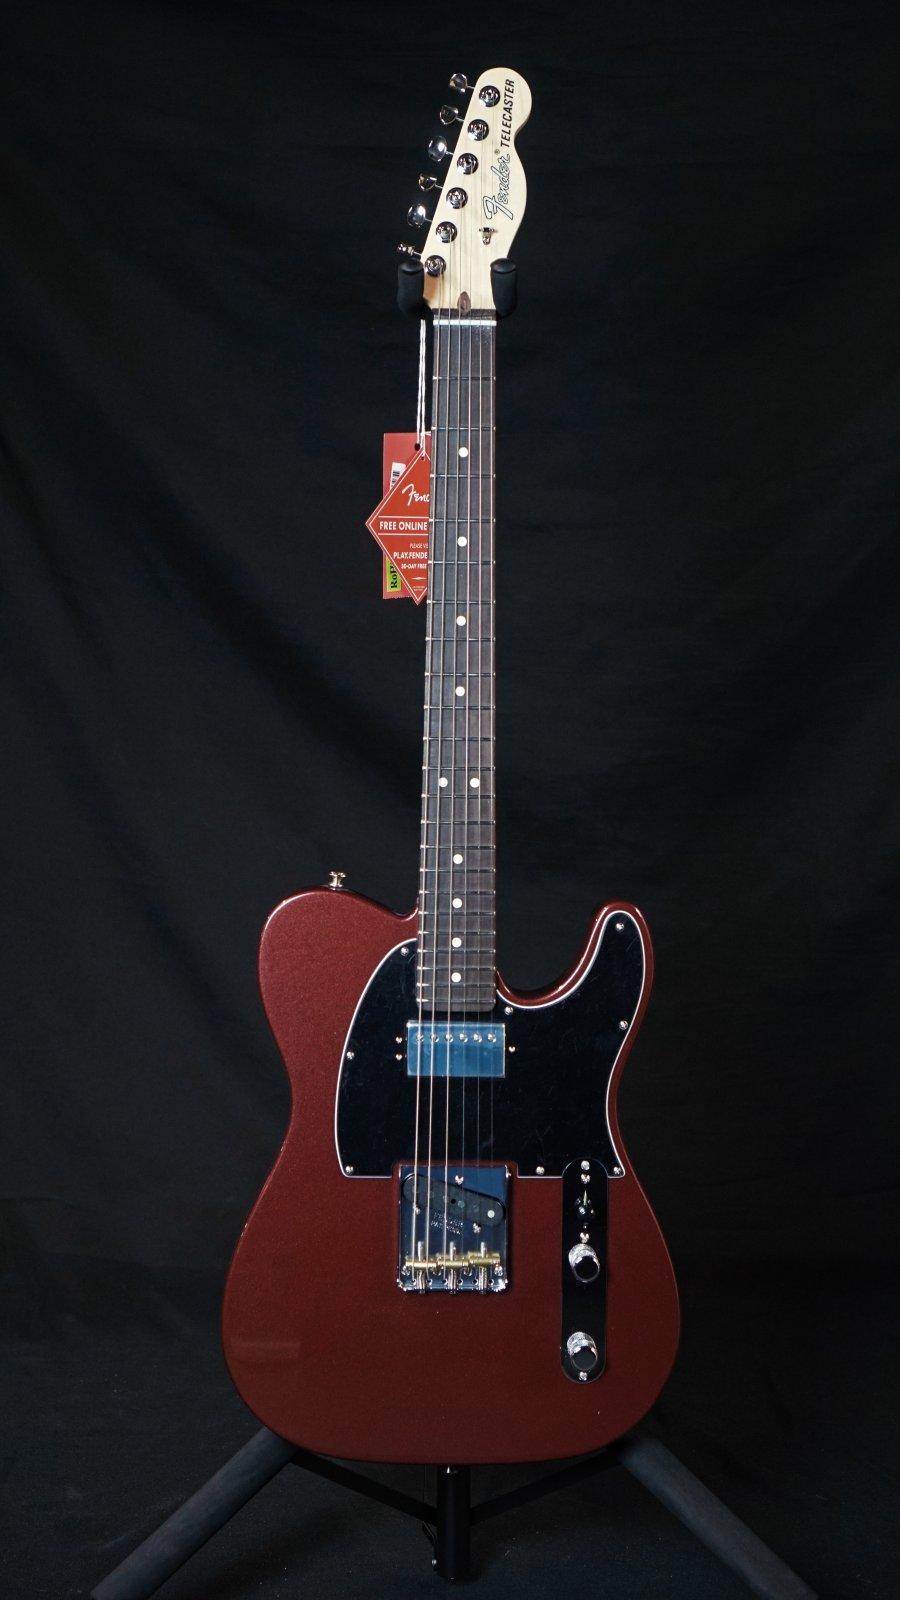 Fender American Performer Telecaster with Humbucking, Rosewood Fingerboard, Aubergine